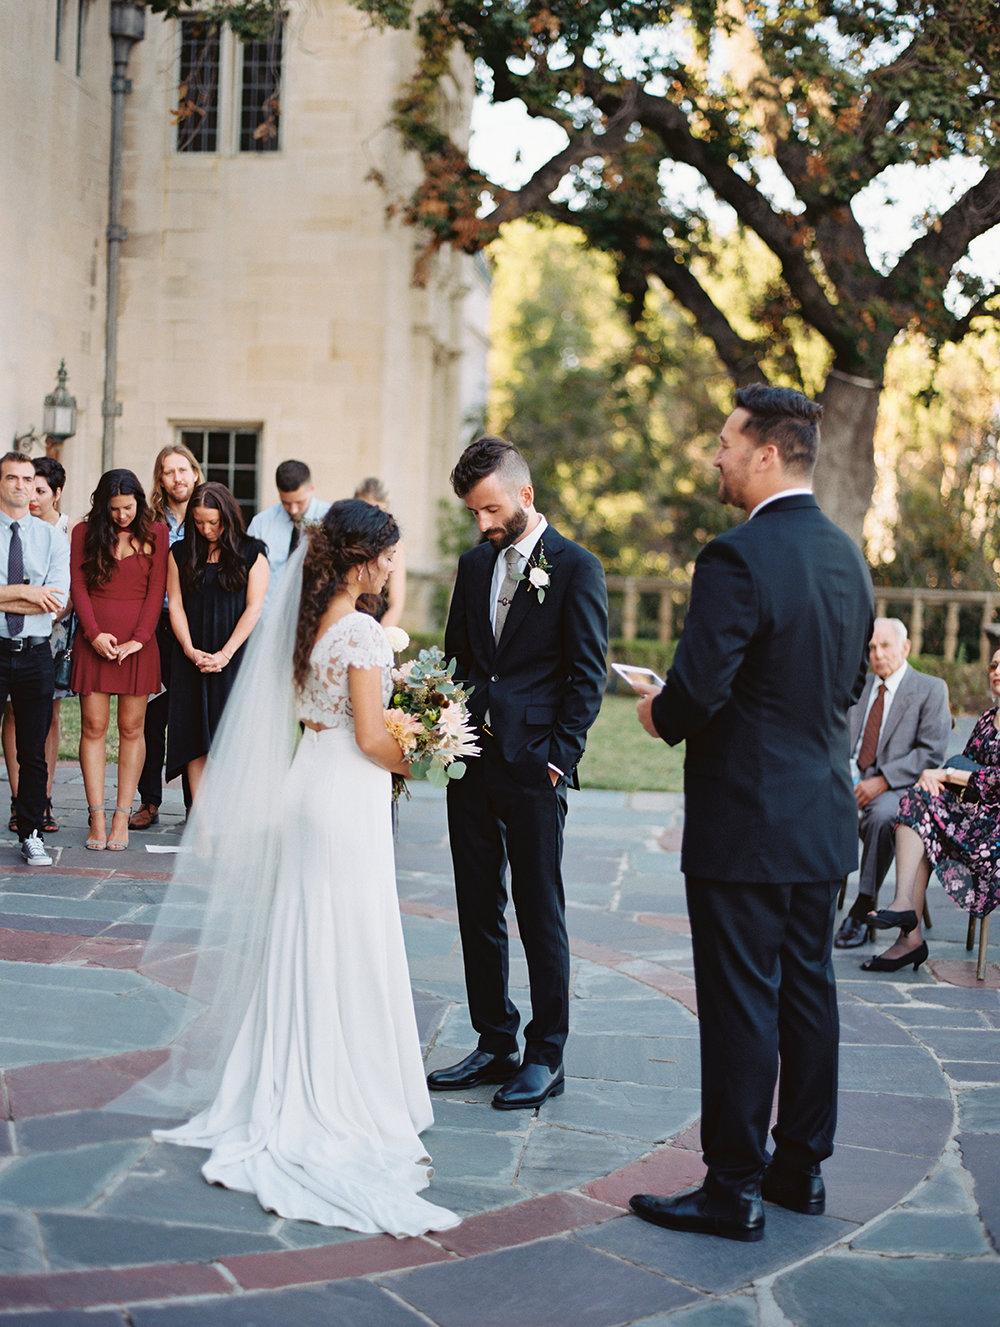 183-brian-sarra-los-angeles-wedding-brumley-wells-photography.jpg